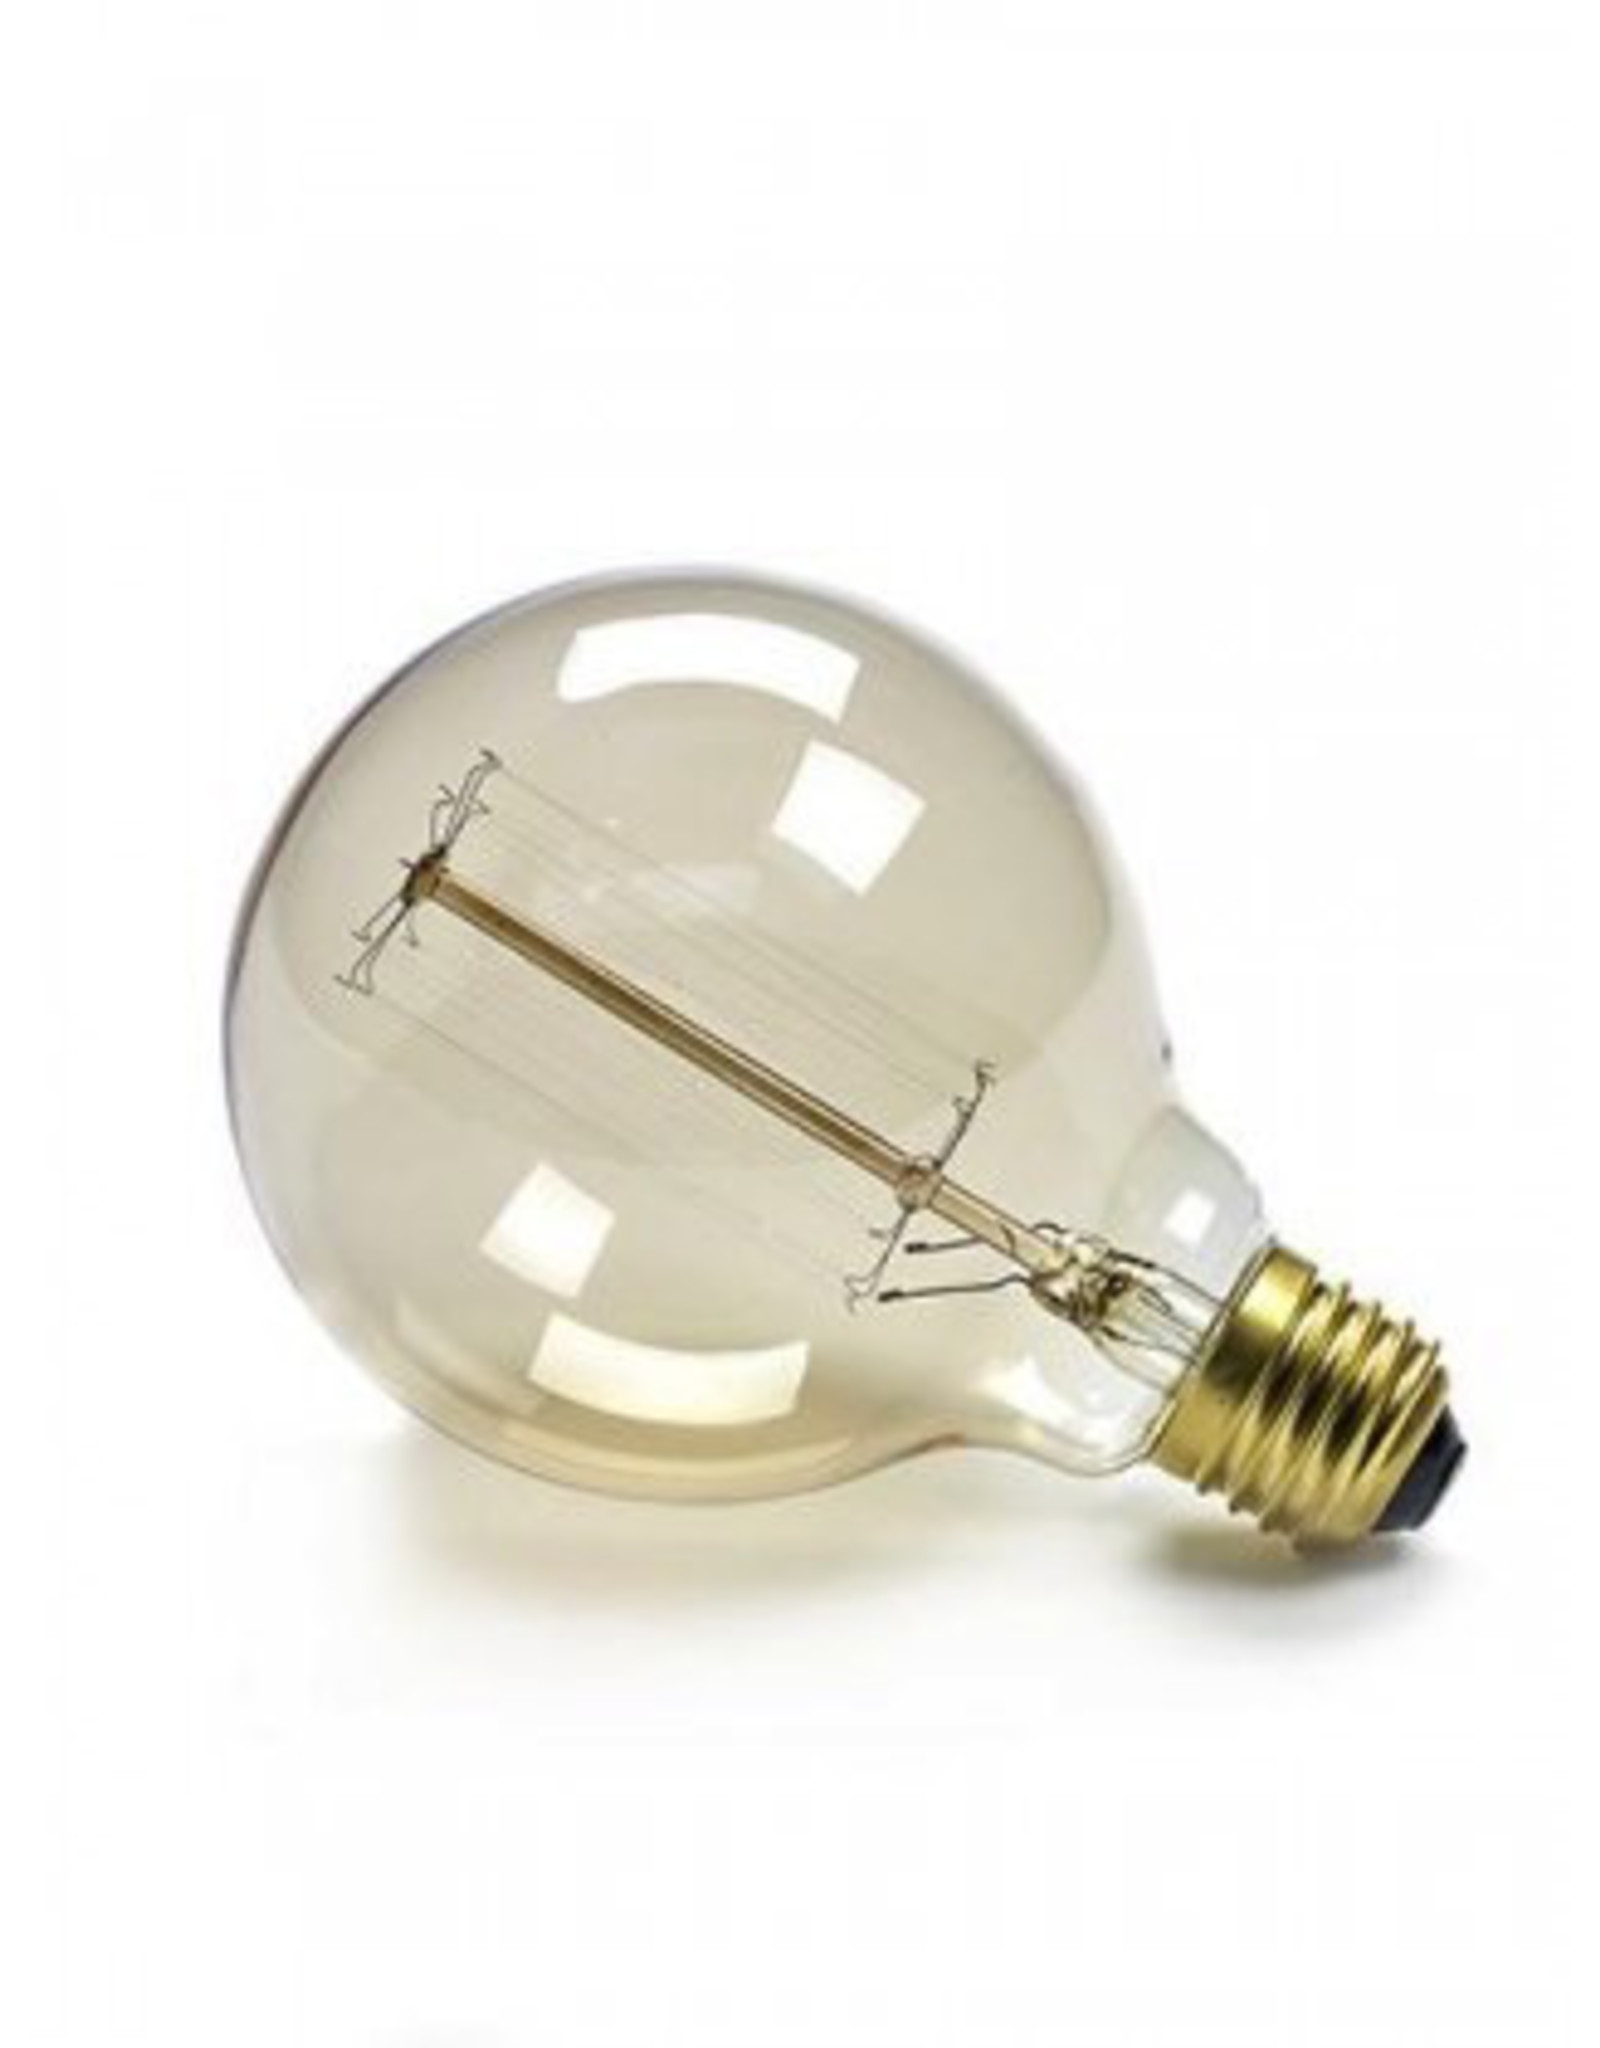 Serax NV EDISON DECO LAMP 90X140MM 25W WHITE BOX